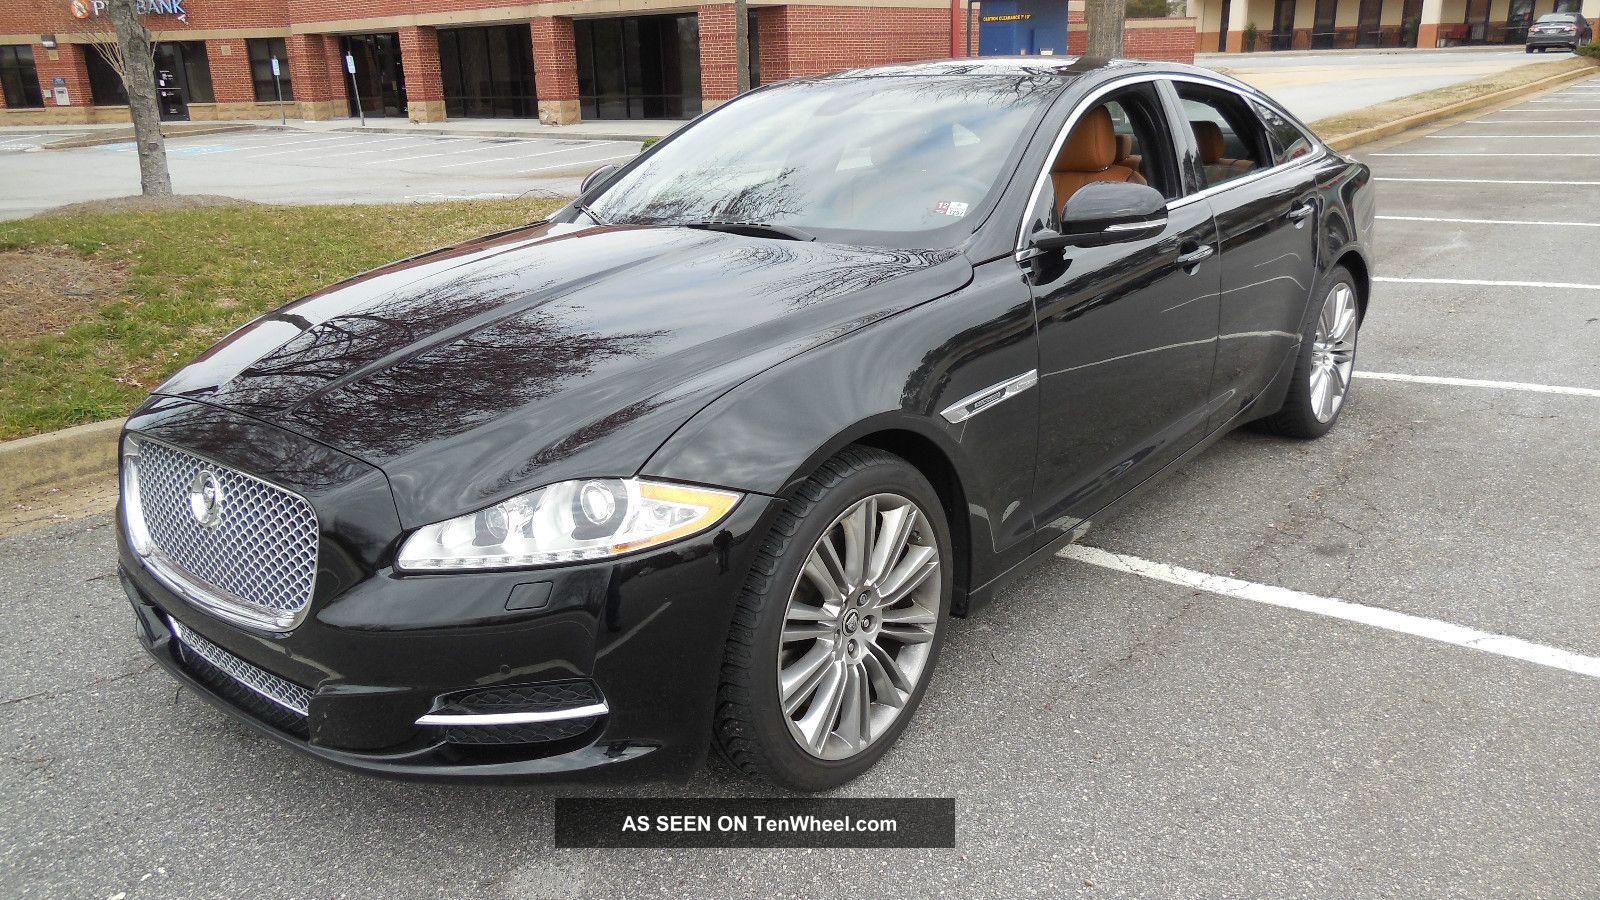 2011 jaguar xj supercharged sedan 4 door 5 0l. Black Bedroom Furniture Sets. Home Design Ideas